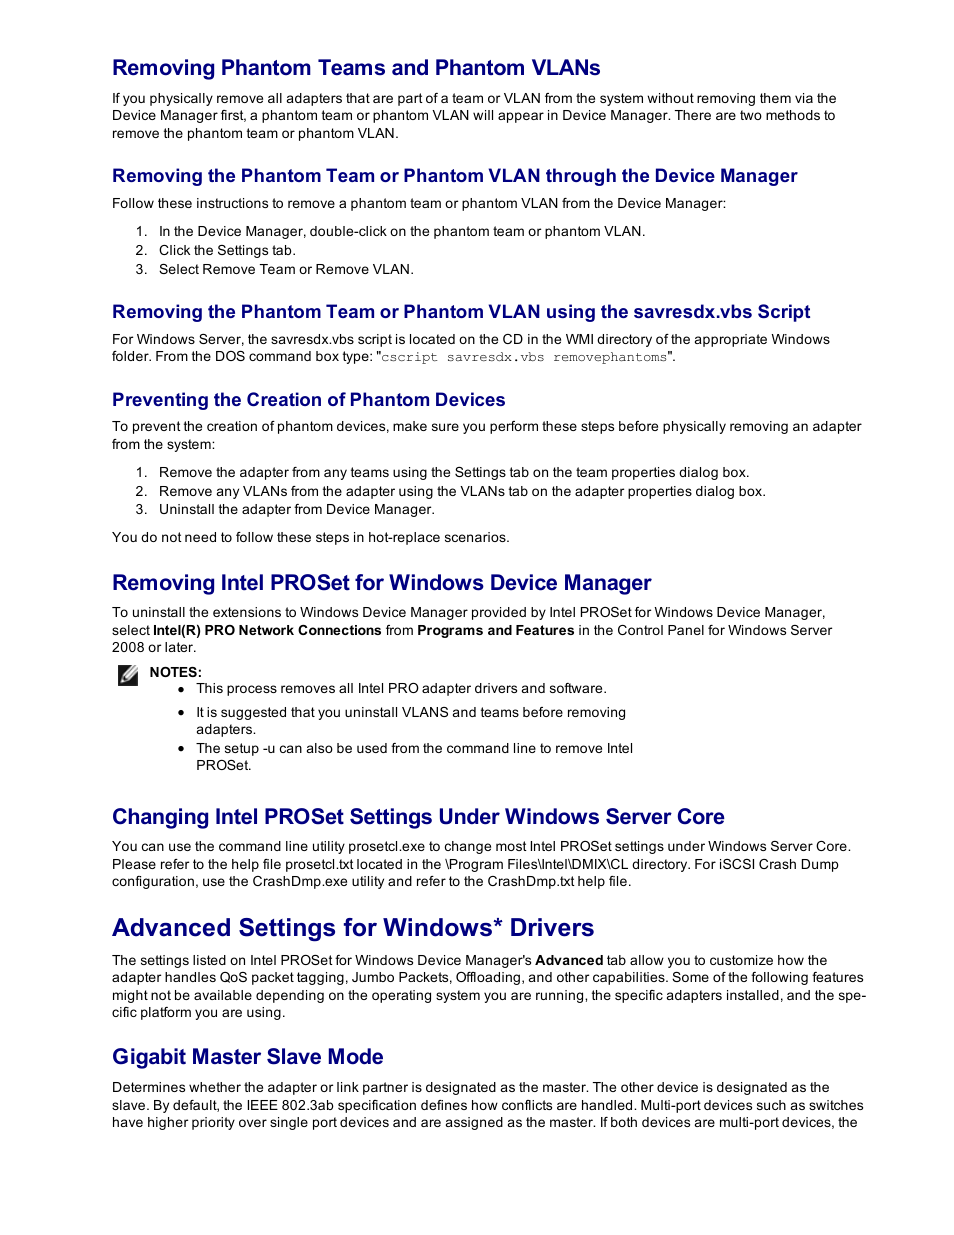 Advanced settings for windows* drivers, Removing phantom teams and